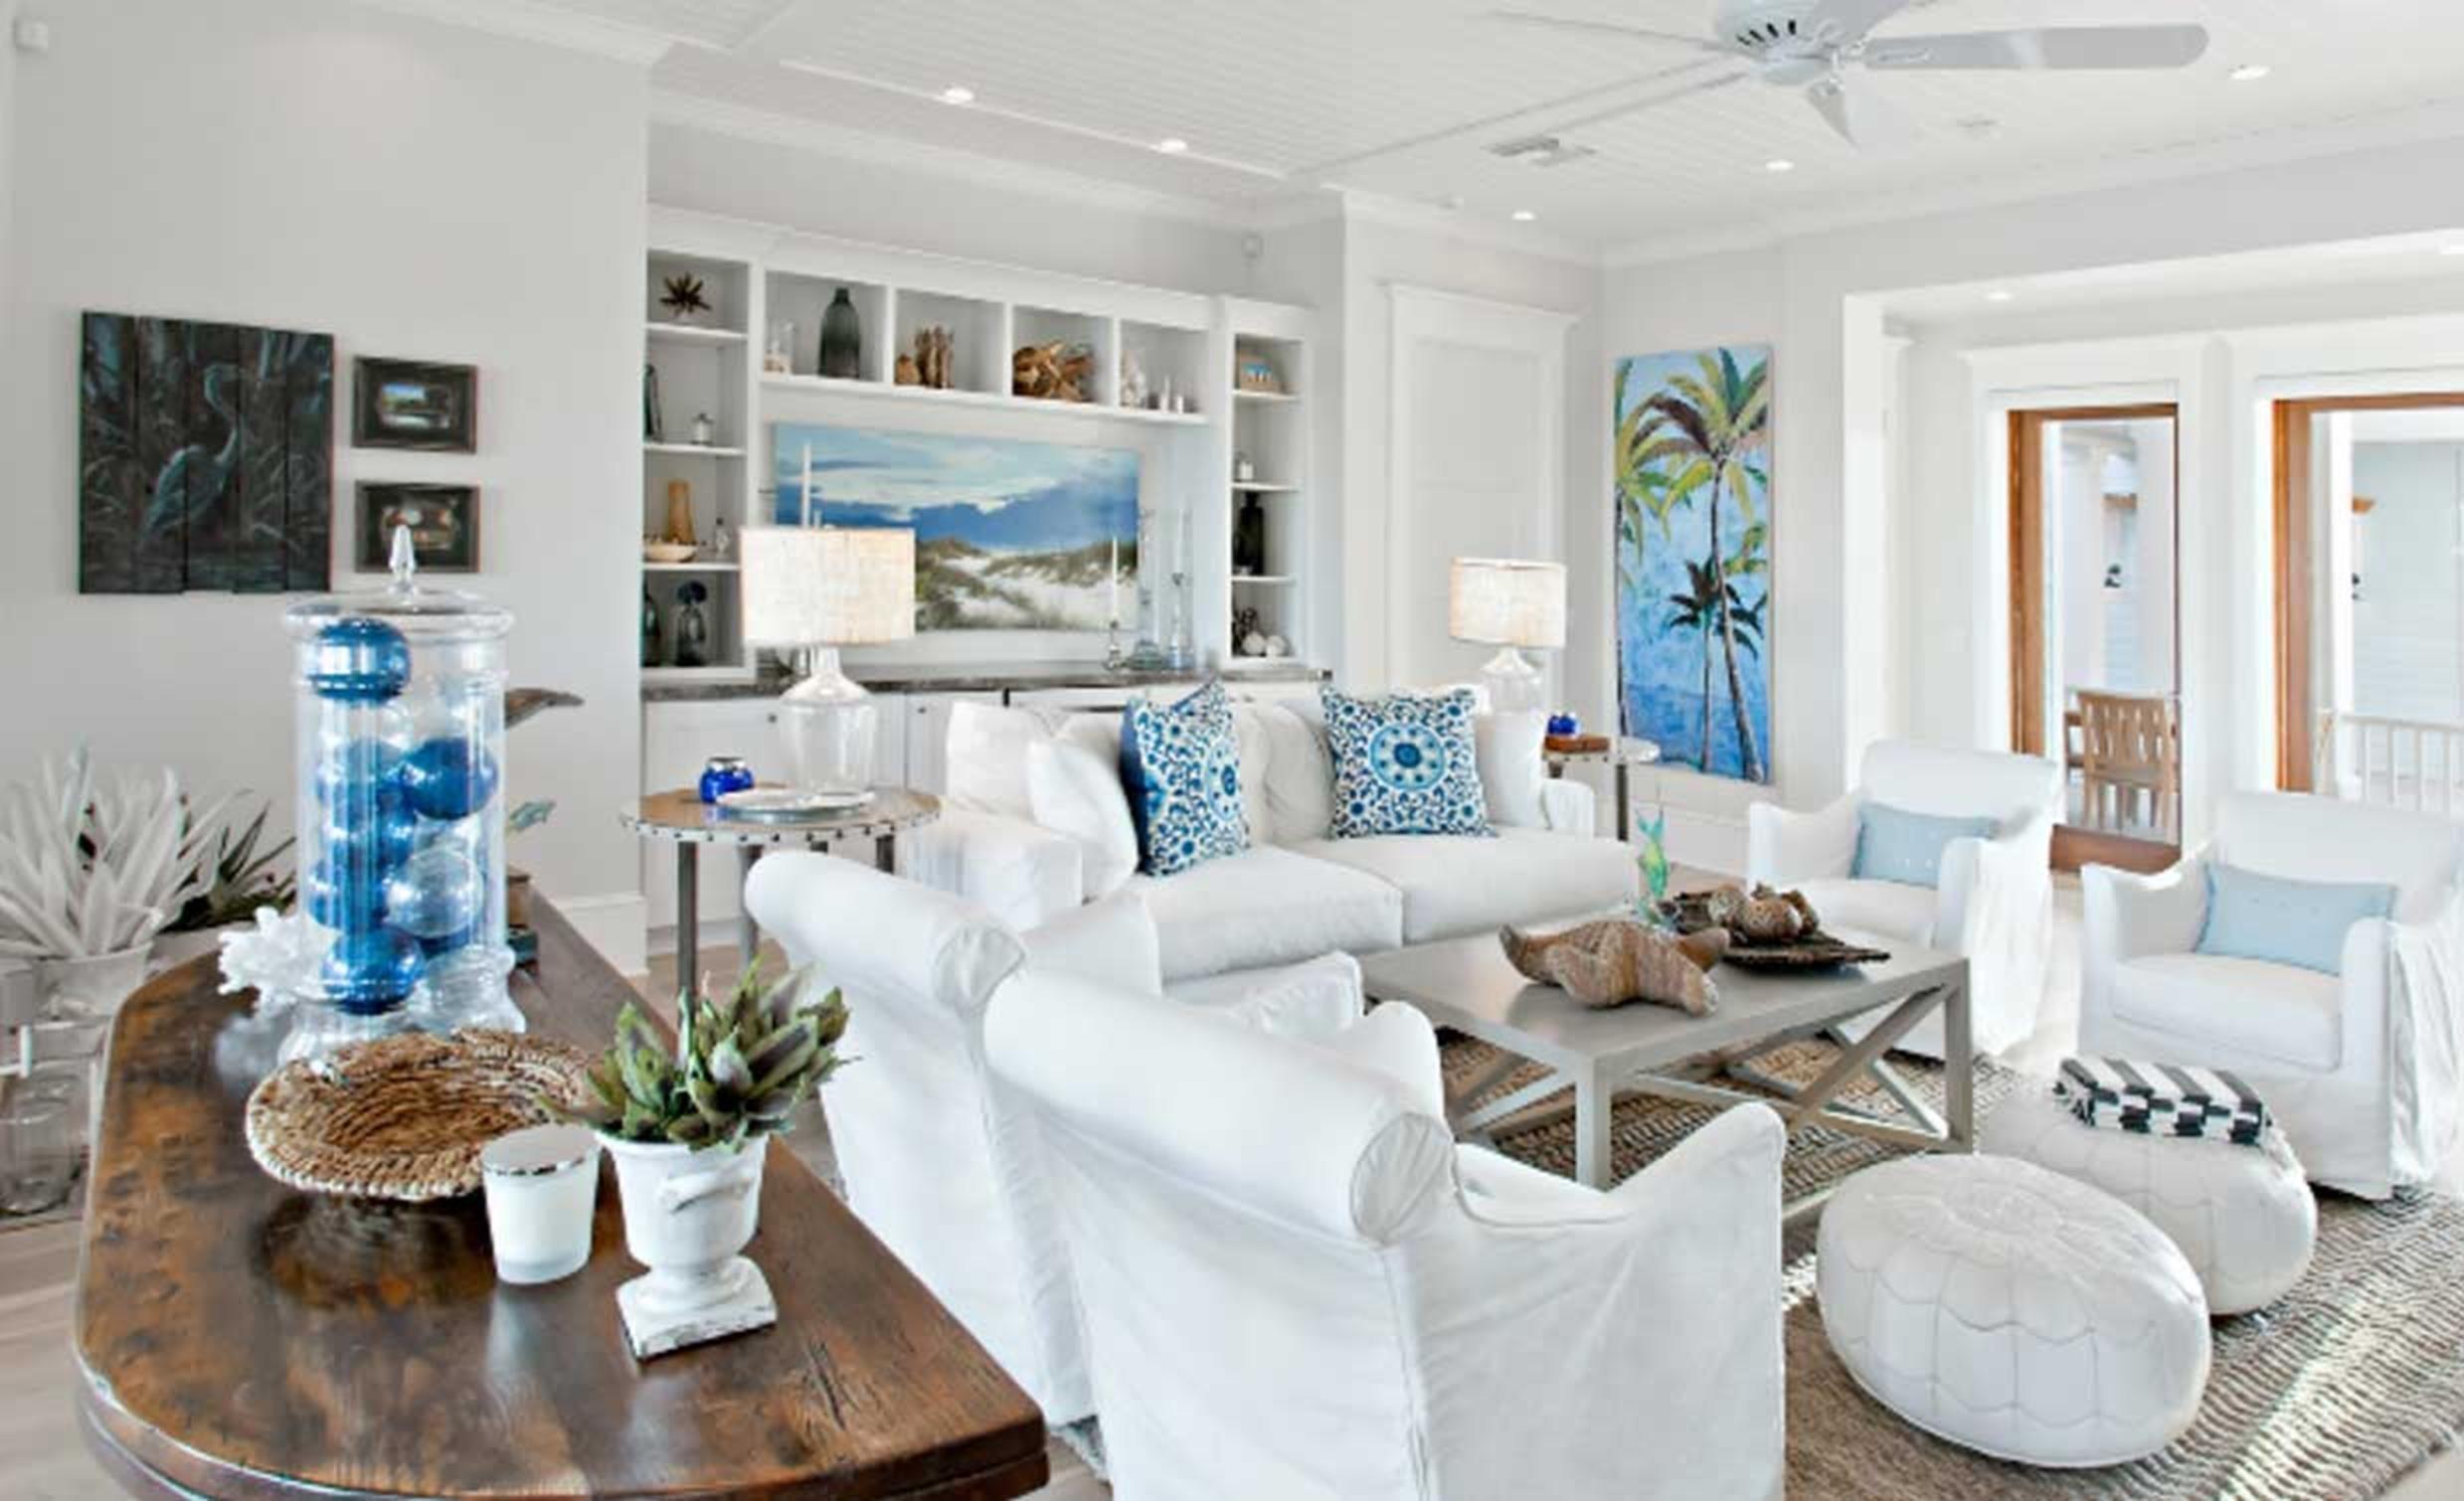 47 Excellence Coastal Kitchen Decorating Table Design #Kitchenthemedecorsets #Coastaldecoratingcurtains